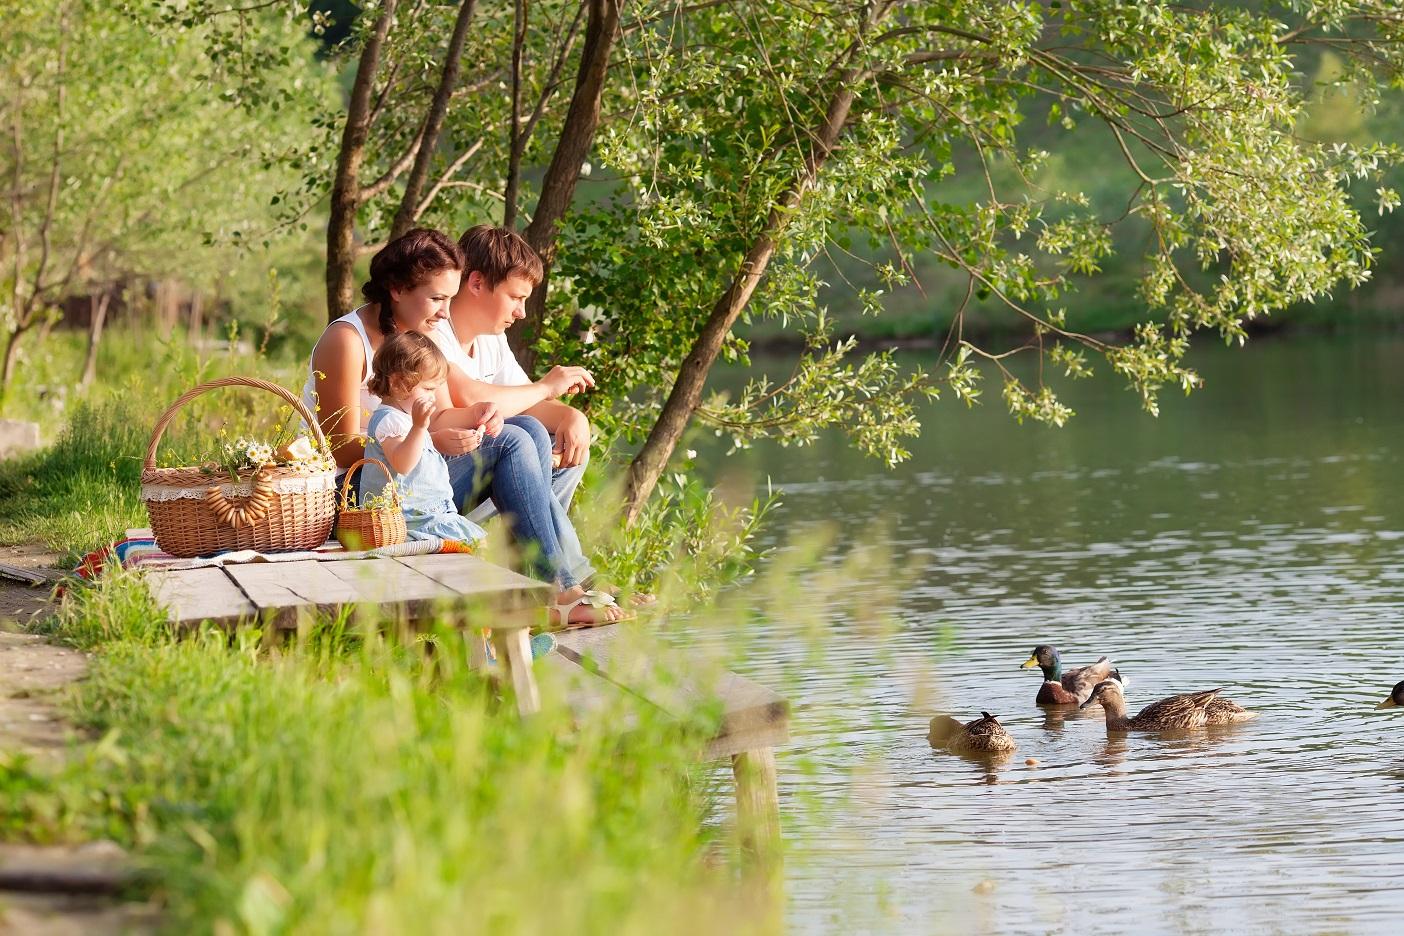 Праздники в июле. Источник фото: Shutterstock